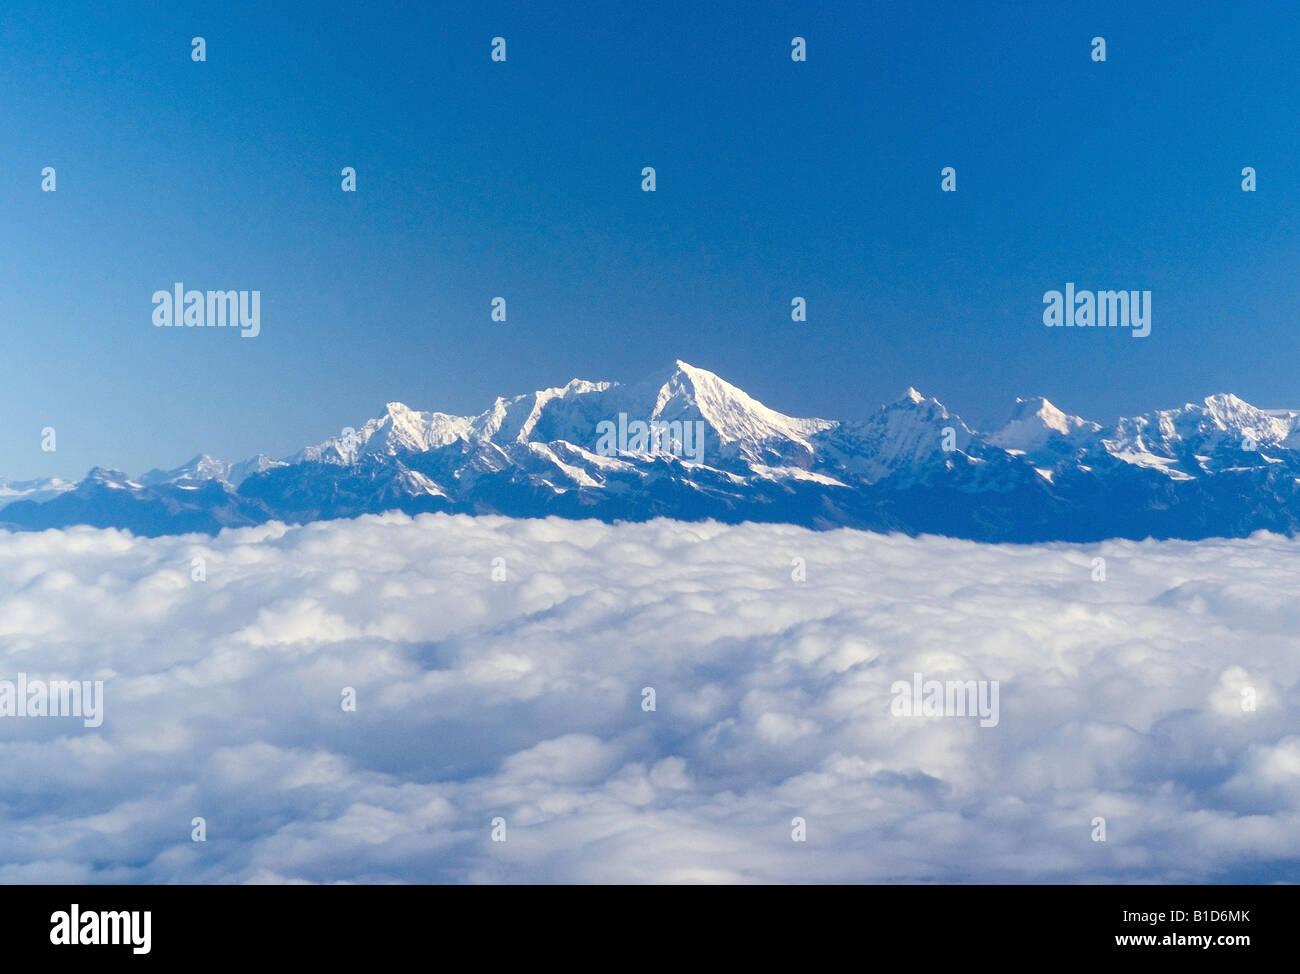 Kings of the Himalaya mountain range, Nuptse, Mount Everest and Lhotse, with blanket of clouds below - Stock Image